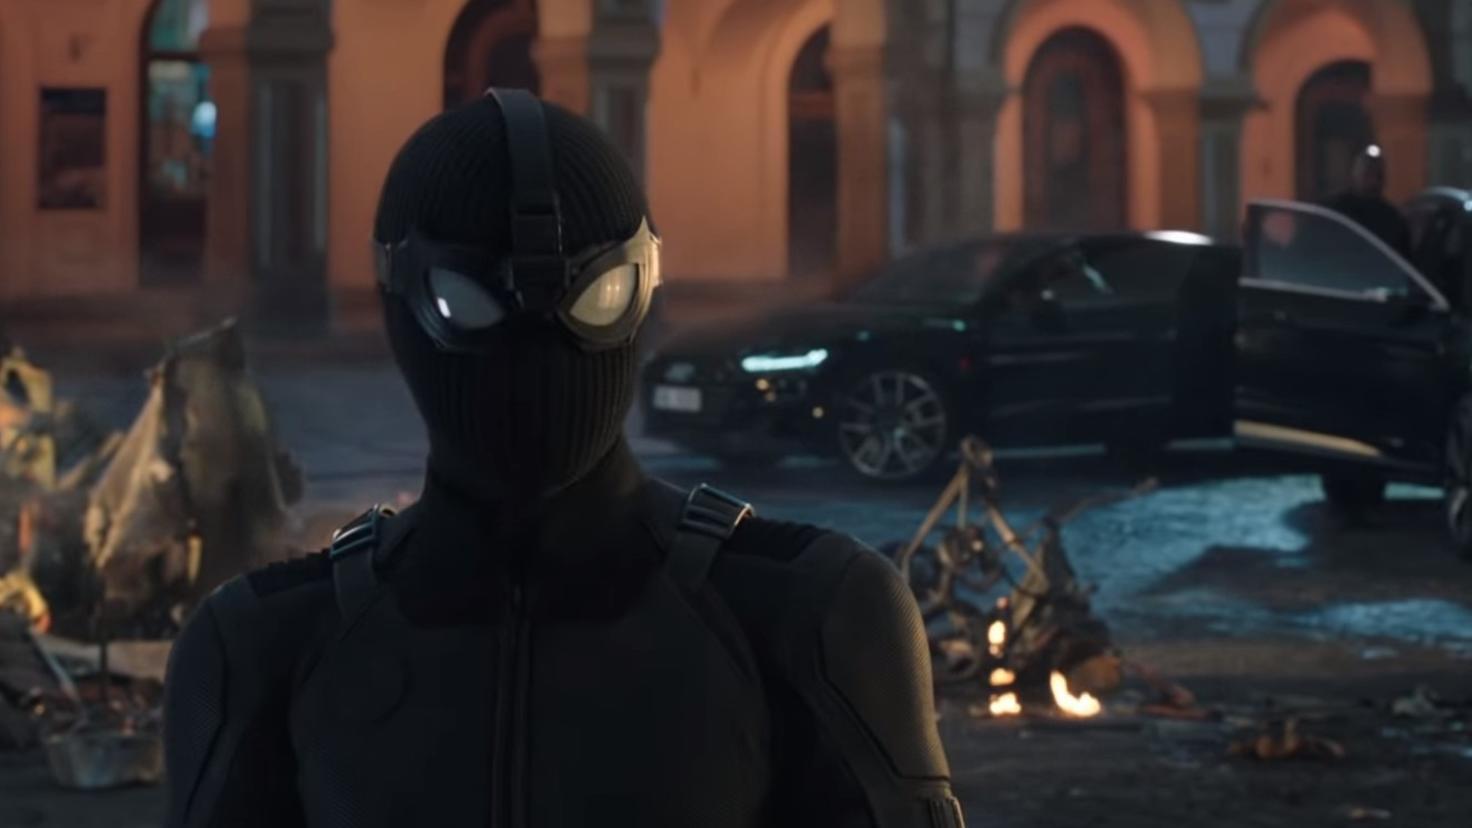 spider-man-far-from-home-trailer-screenshot-07